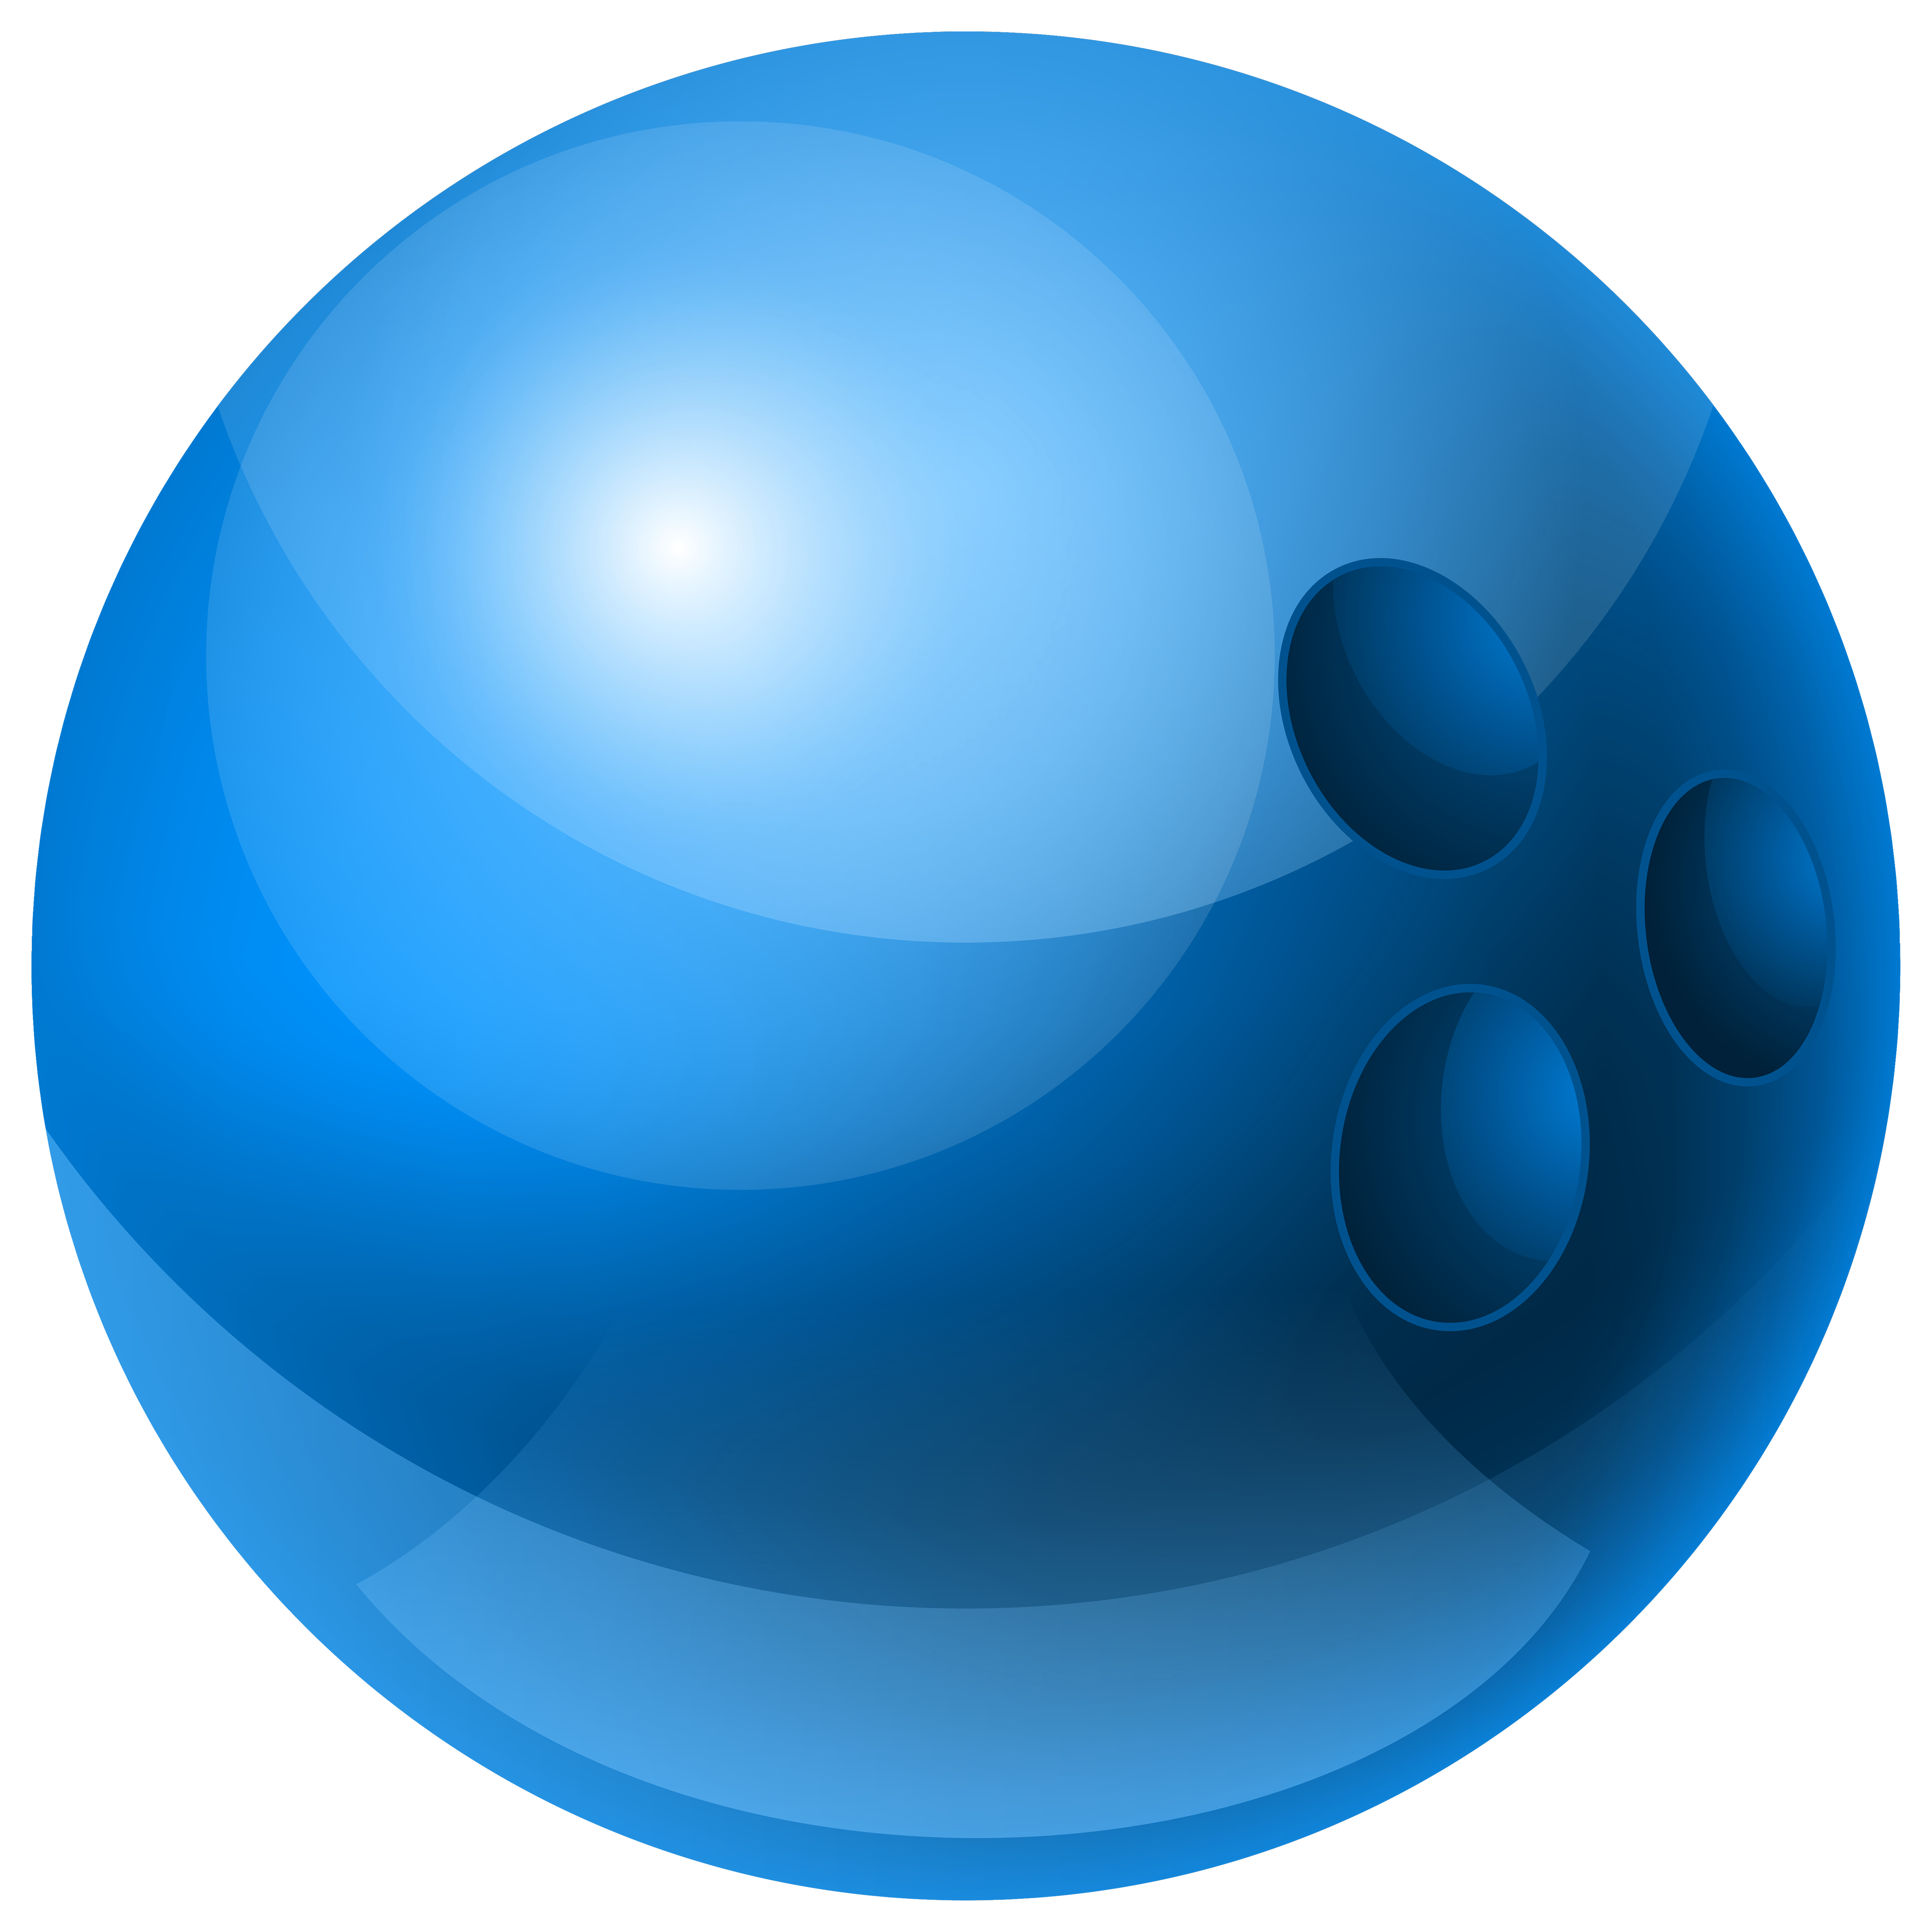 bowling ball clipart - Bowling Ball Clipart